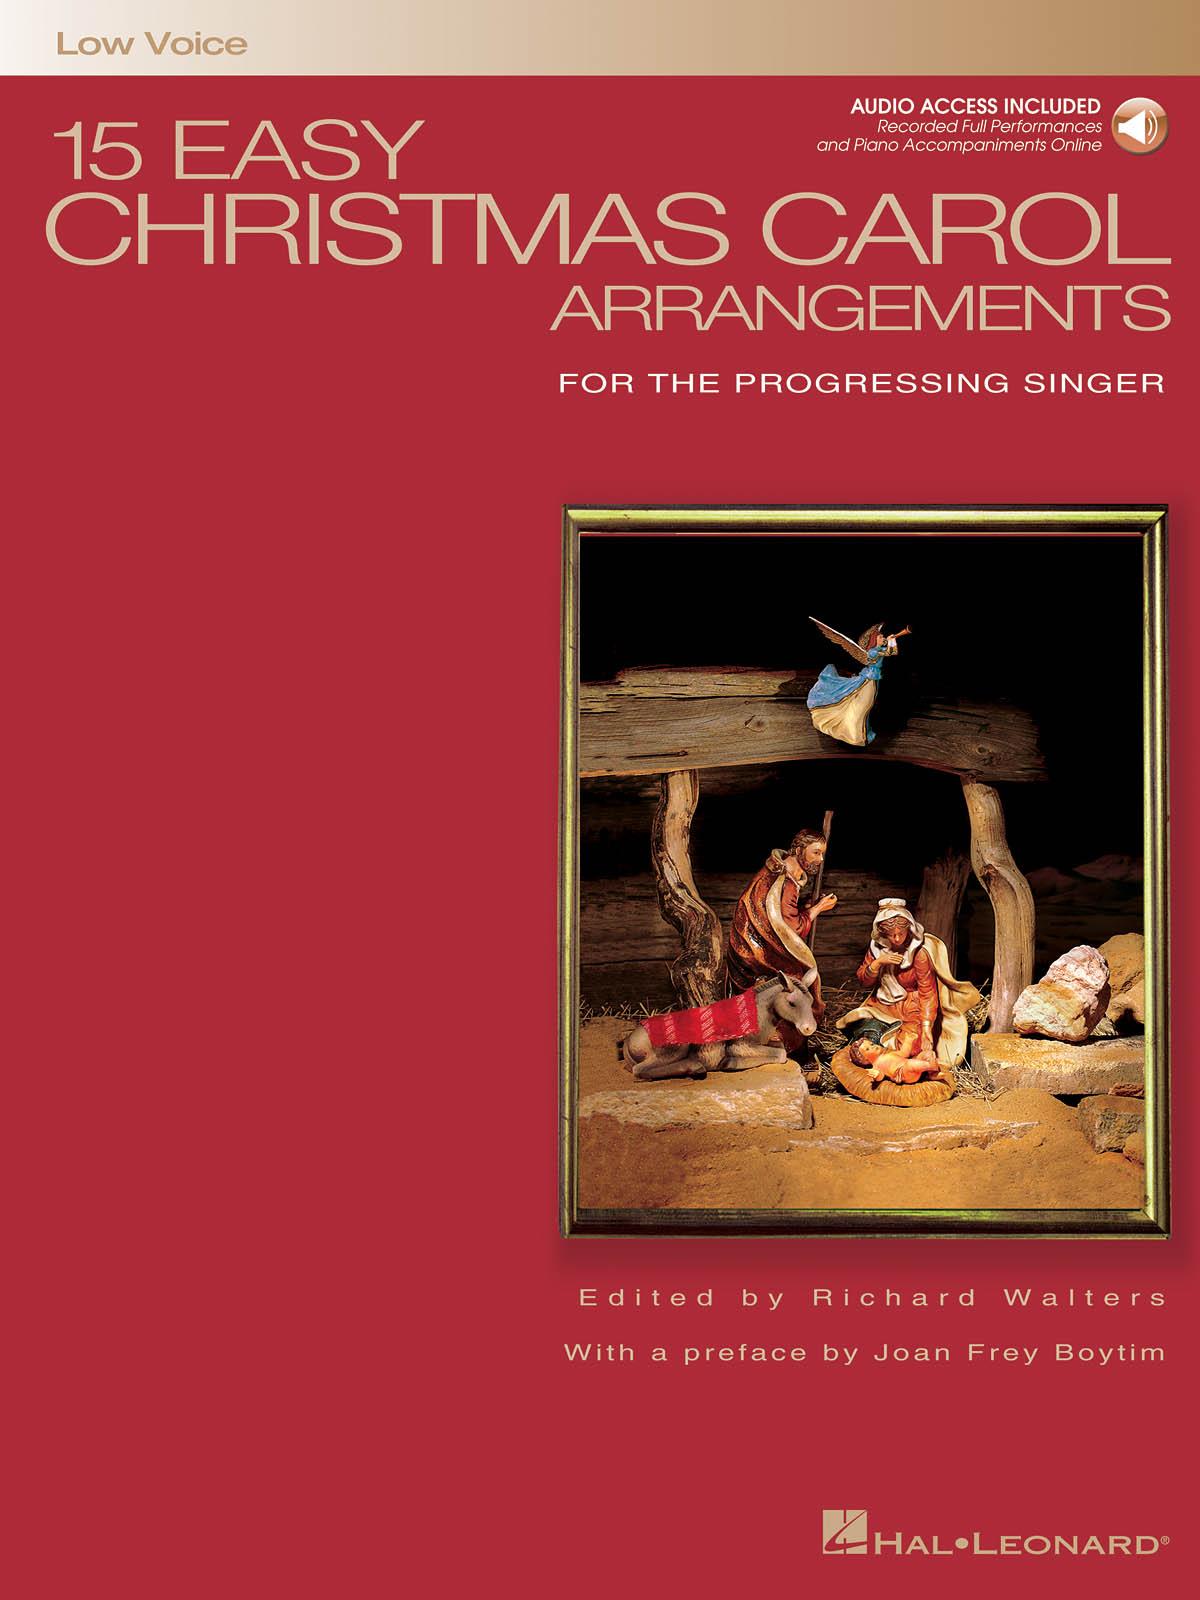 15 Easy Christmas Carol Arrangements (Low Voice): Vocal and Piano: Vocal Album